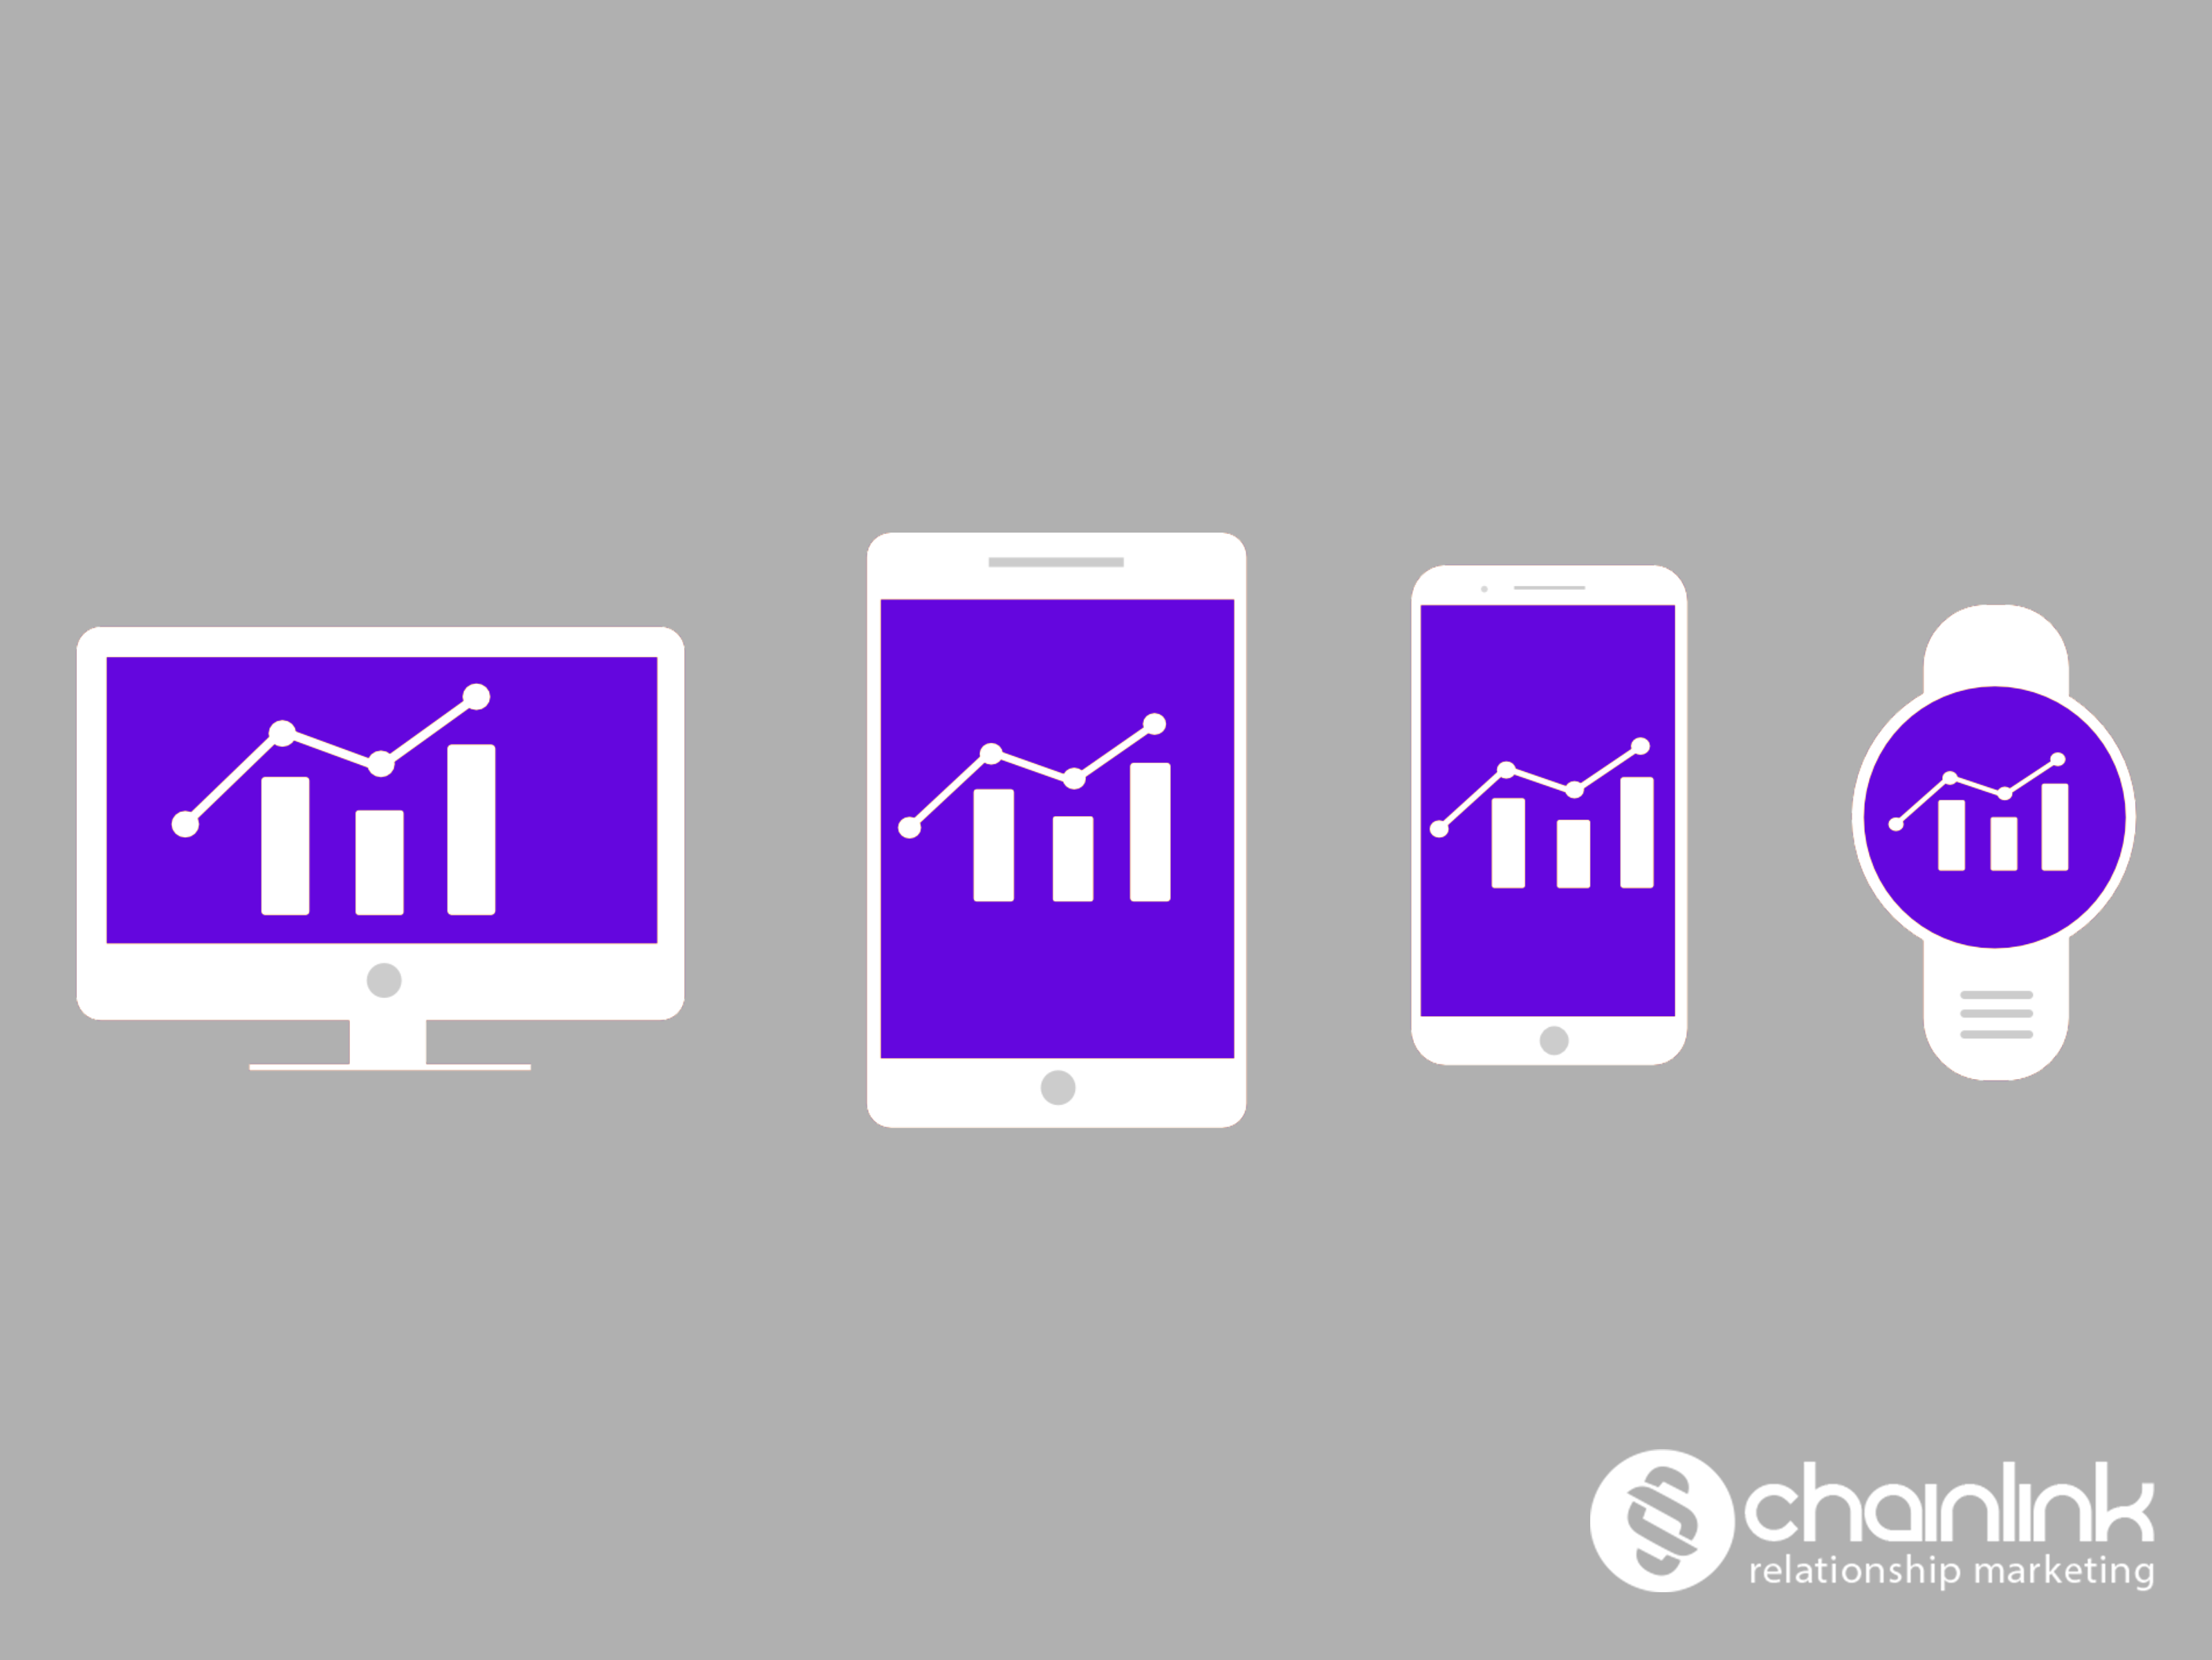 Chainlink Relationship Marketing- digital marketing trends